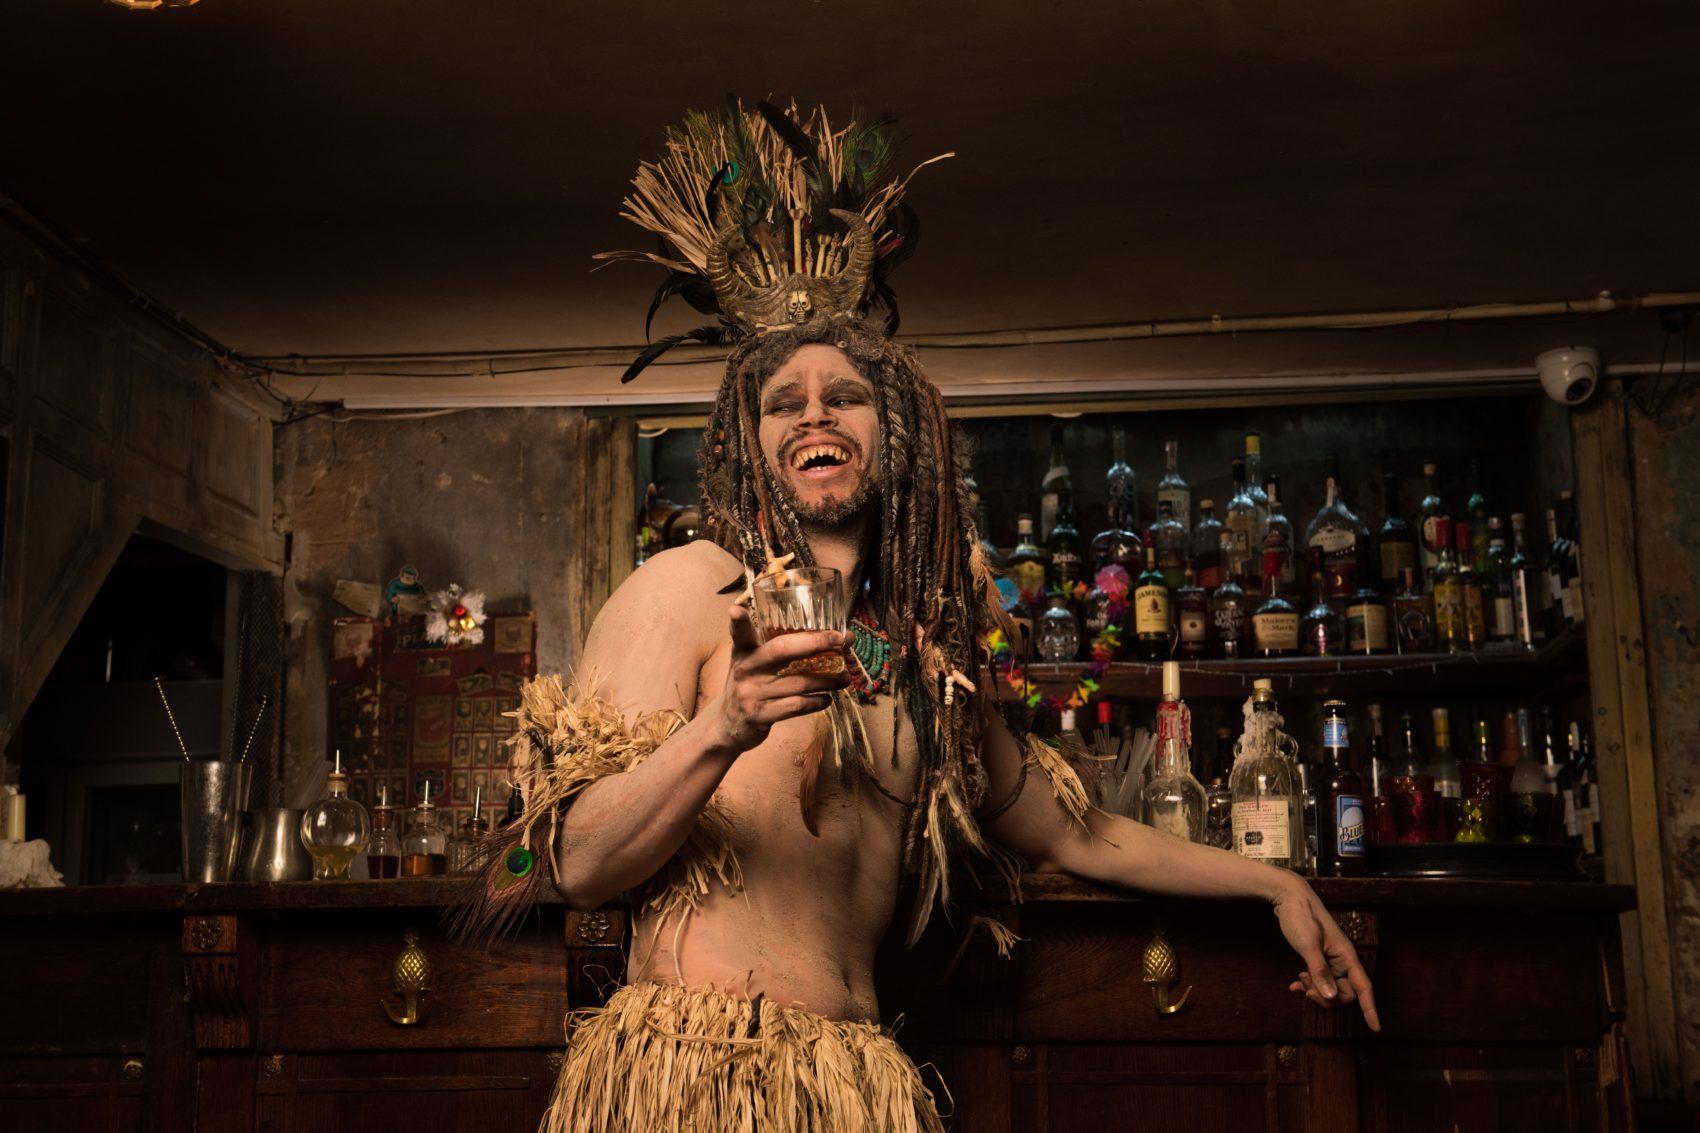 John Macmillan as Voodoo king Professor Lofuko in 'Famalam'. Photo: Des Willie/ BBC3